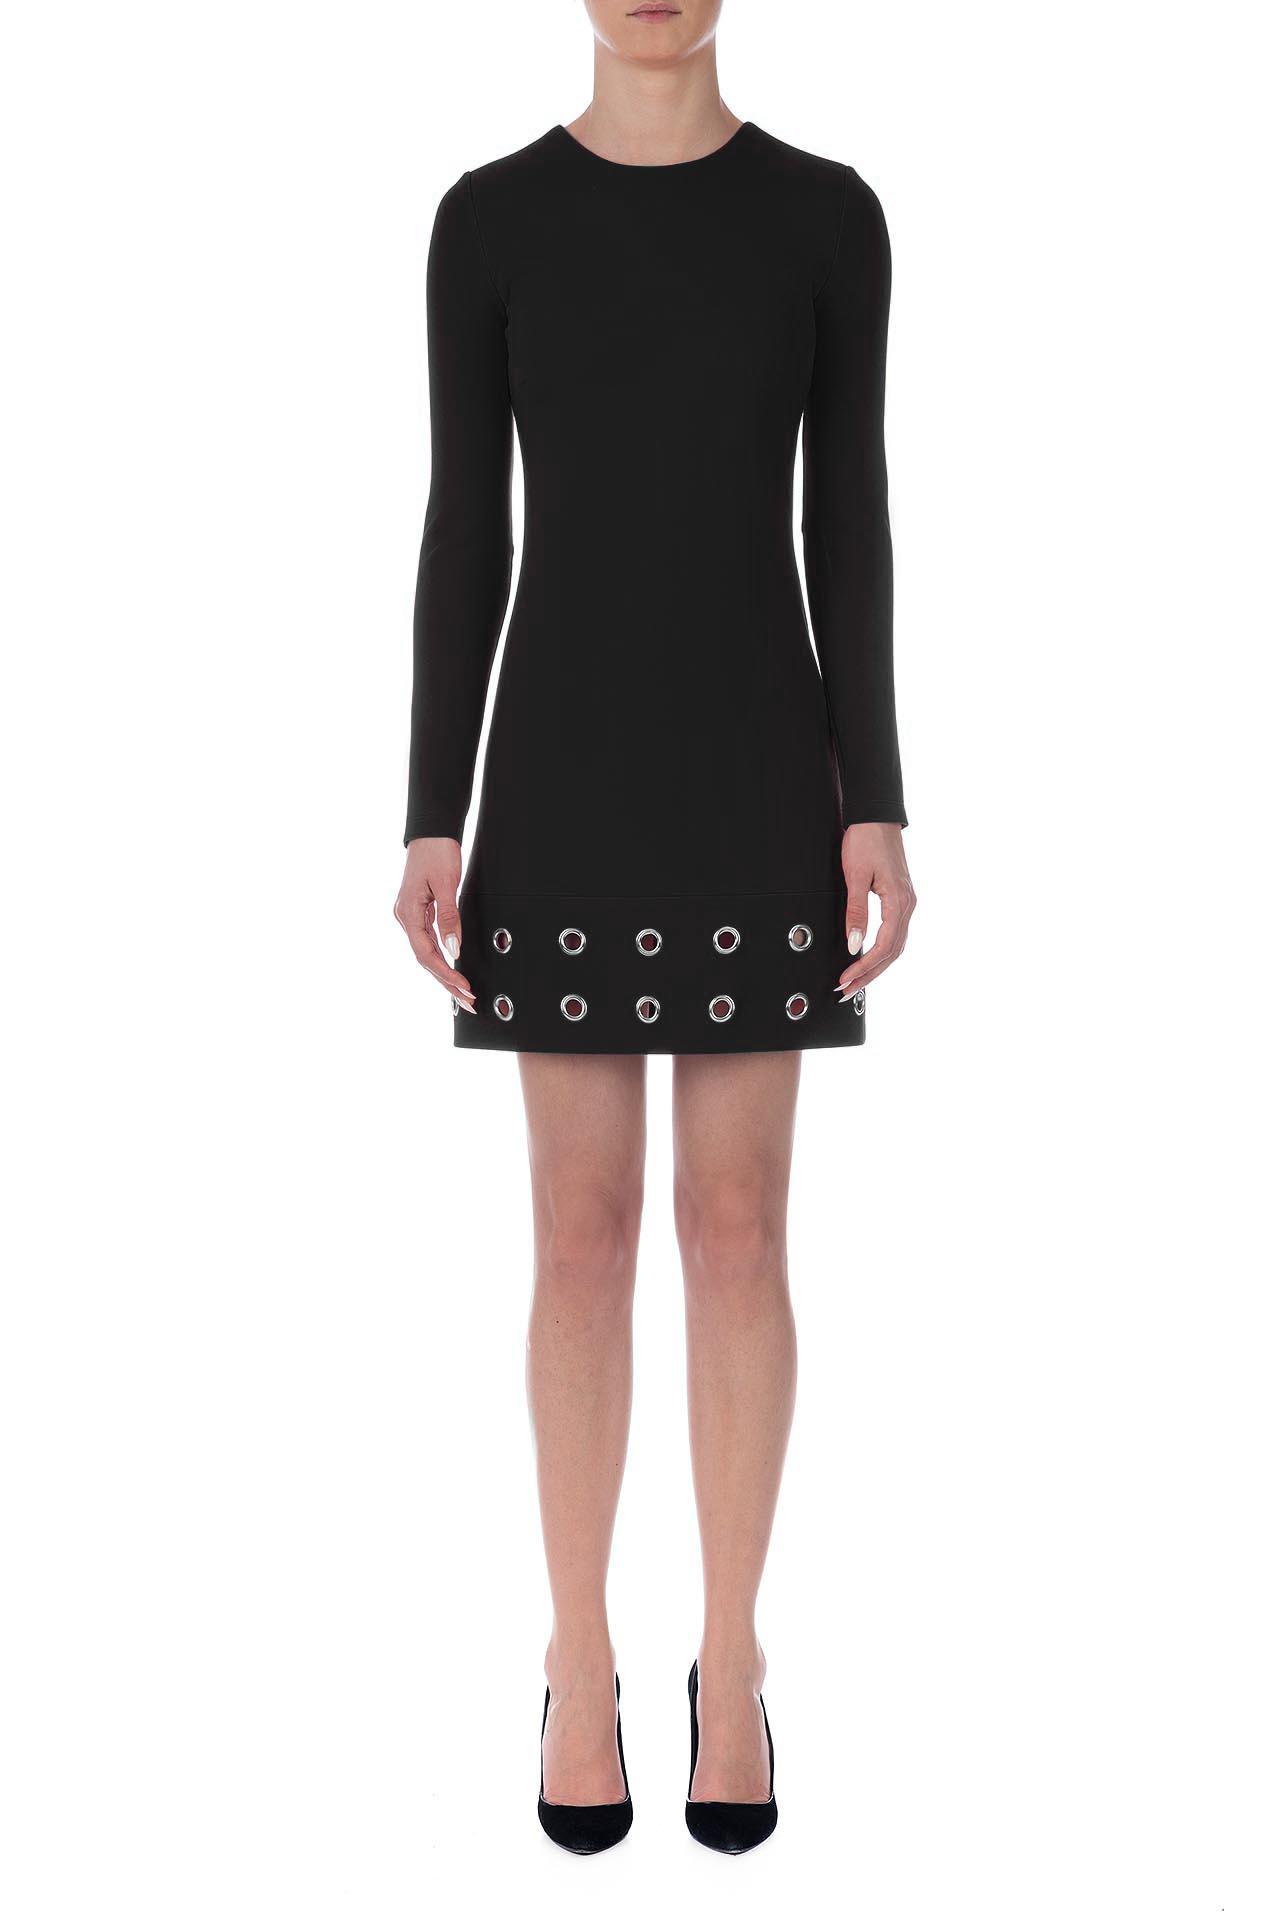 DRESS OKI BLACK 1